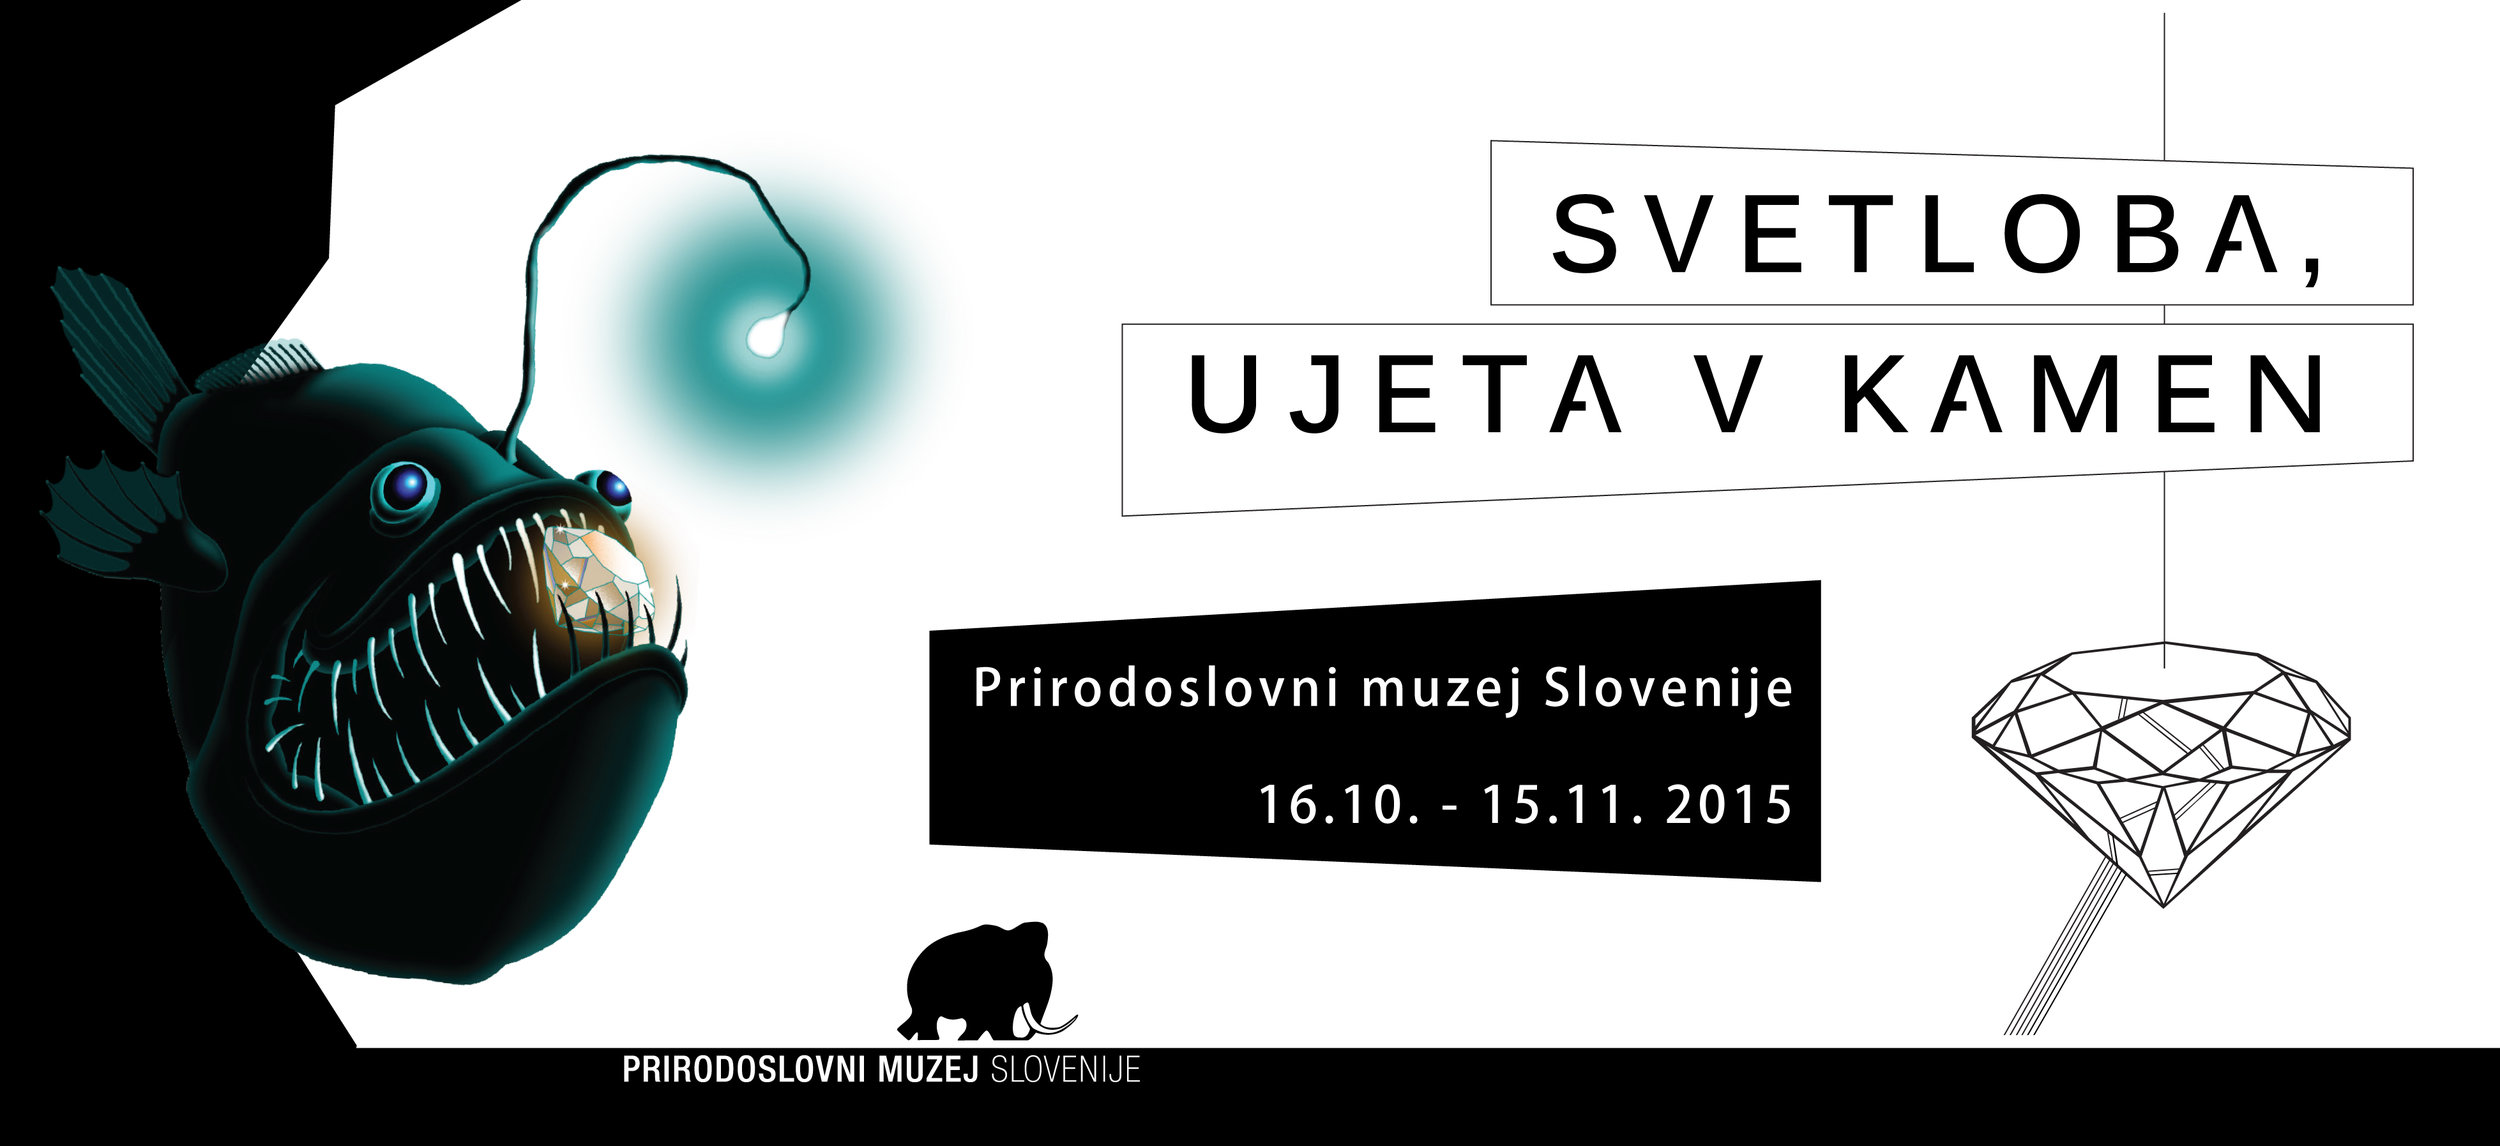 - GROUP EXHIBITION / SLOVENIAN MUSEUM OF NATIONAL HISTORYLJUBLJANA / SLOVENIA